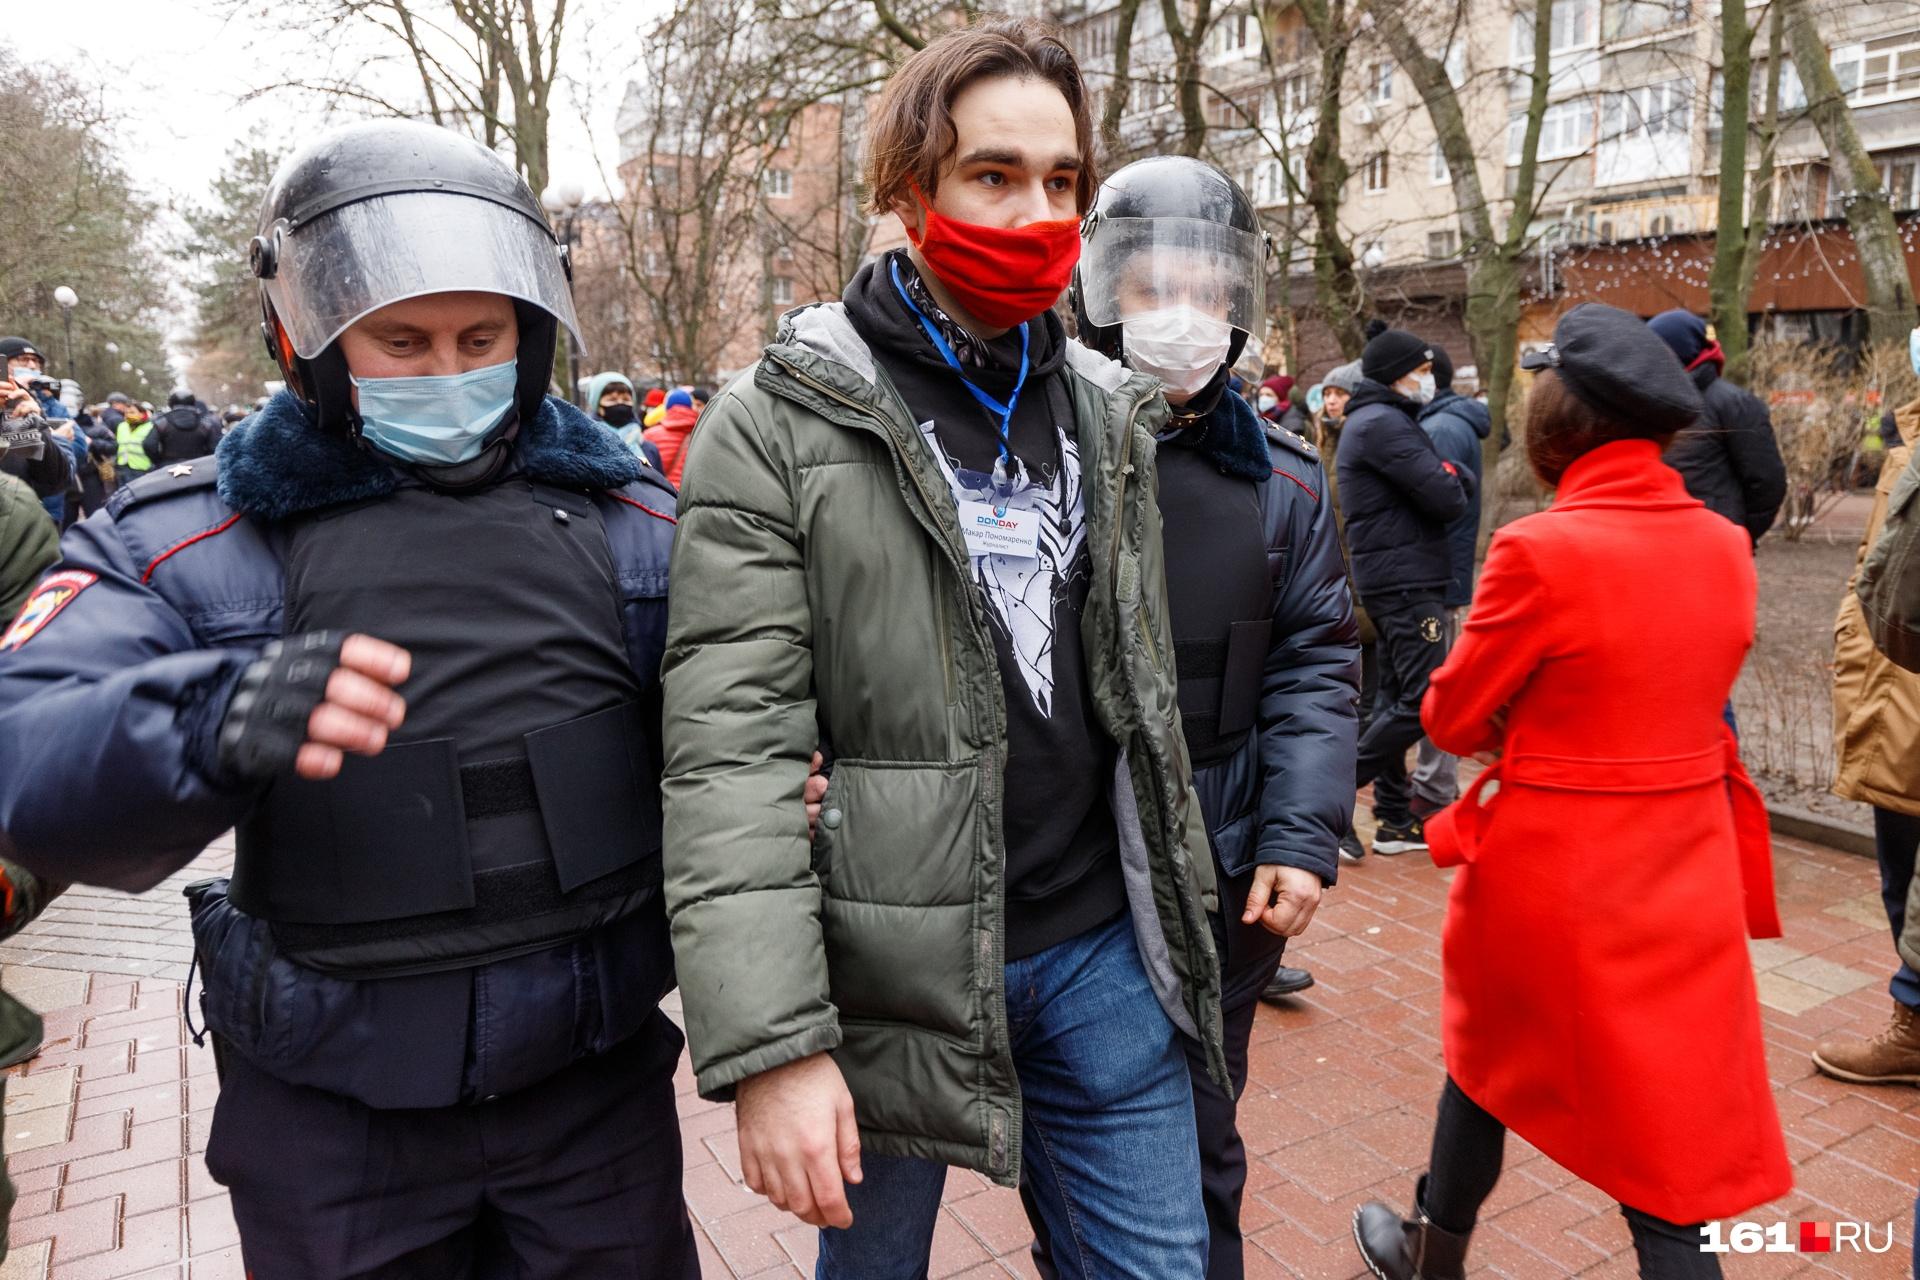 Макар Паламаренко — журналист издания DonDay